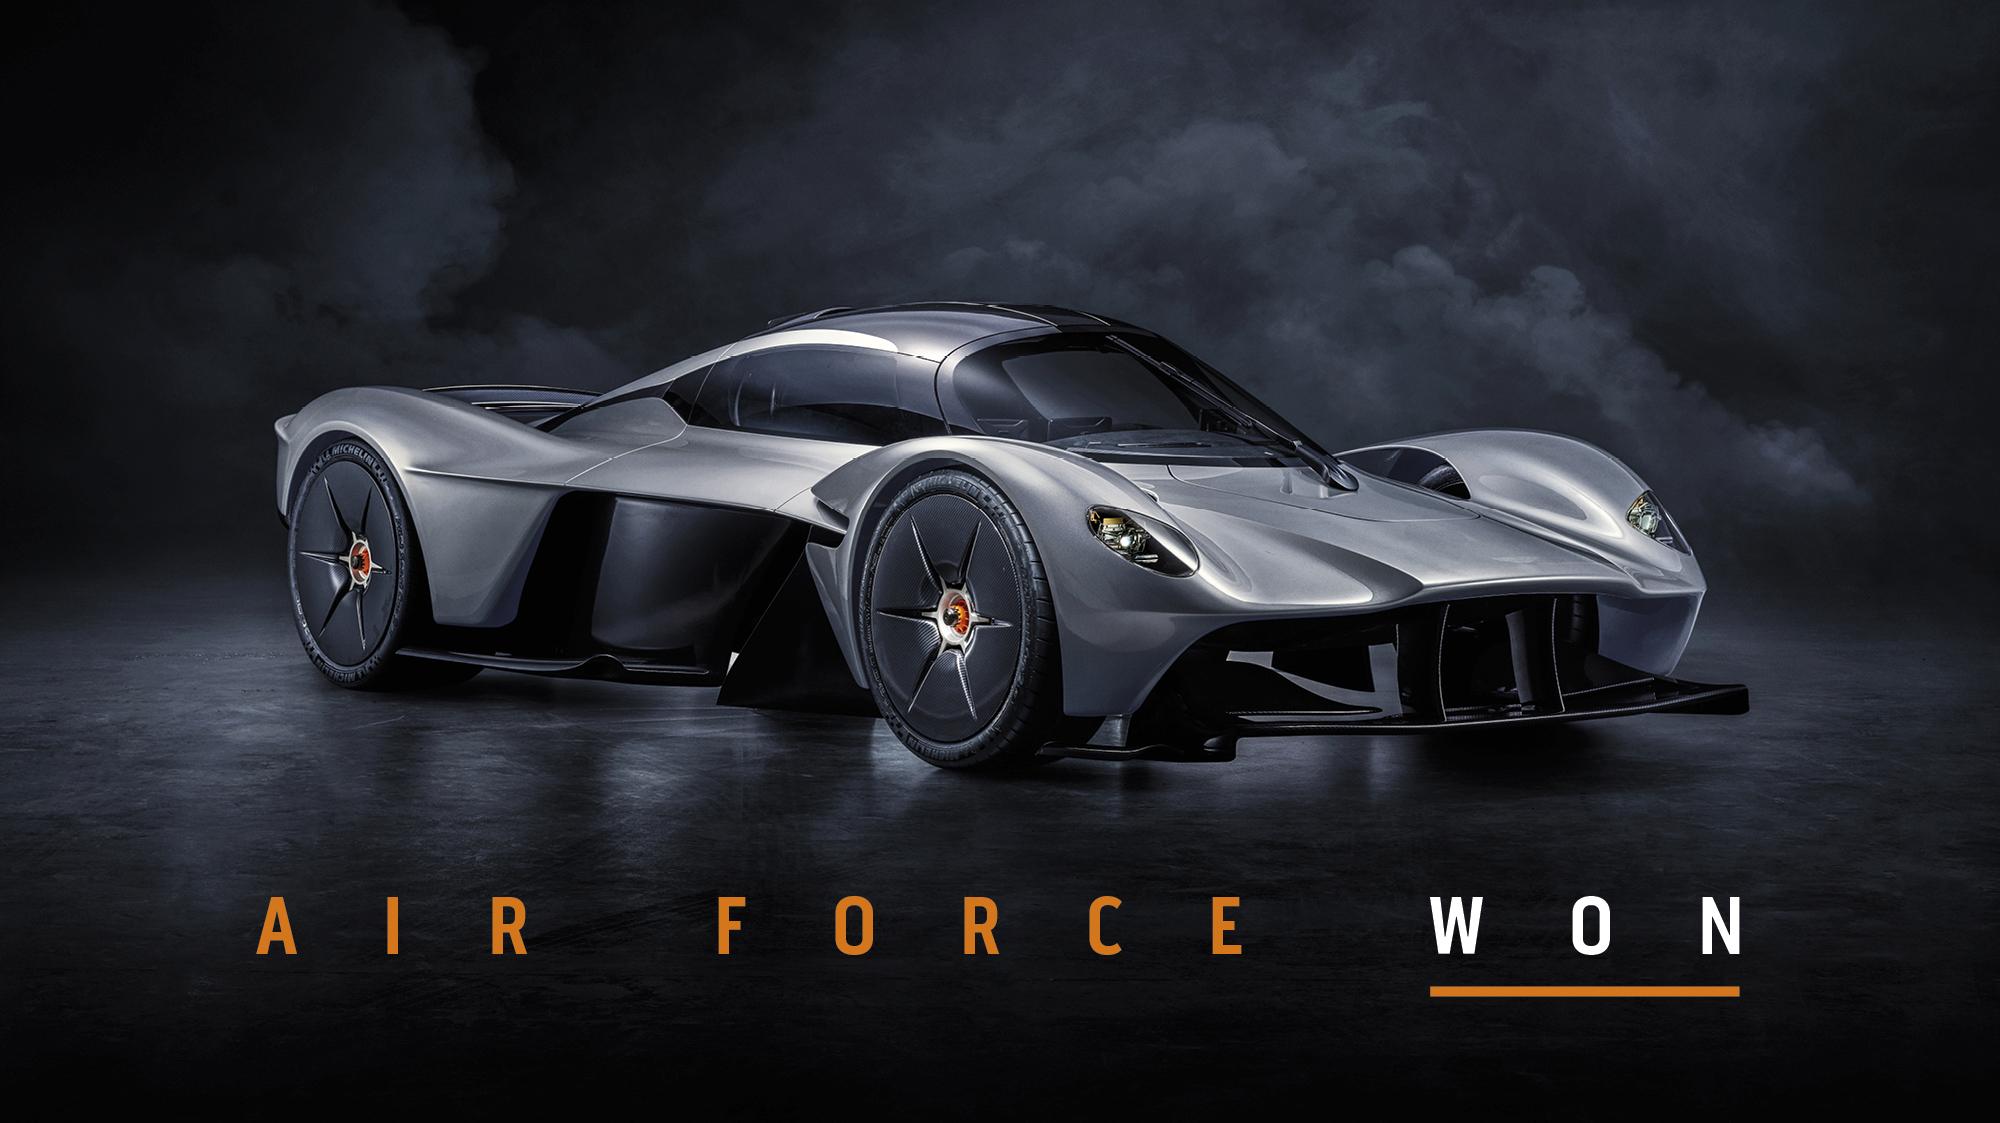 Aston Martin Valkyrie big read image